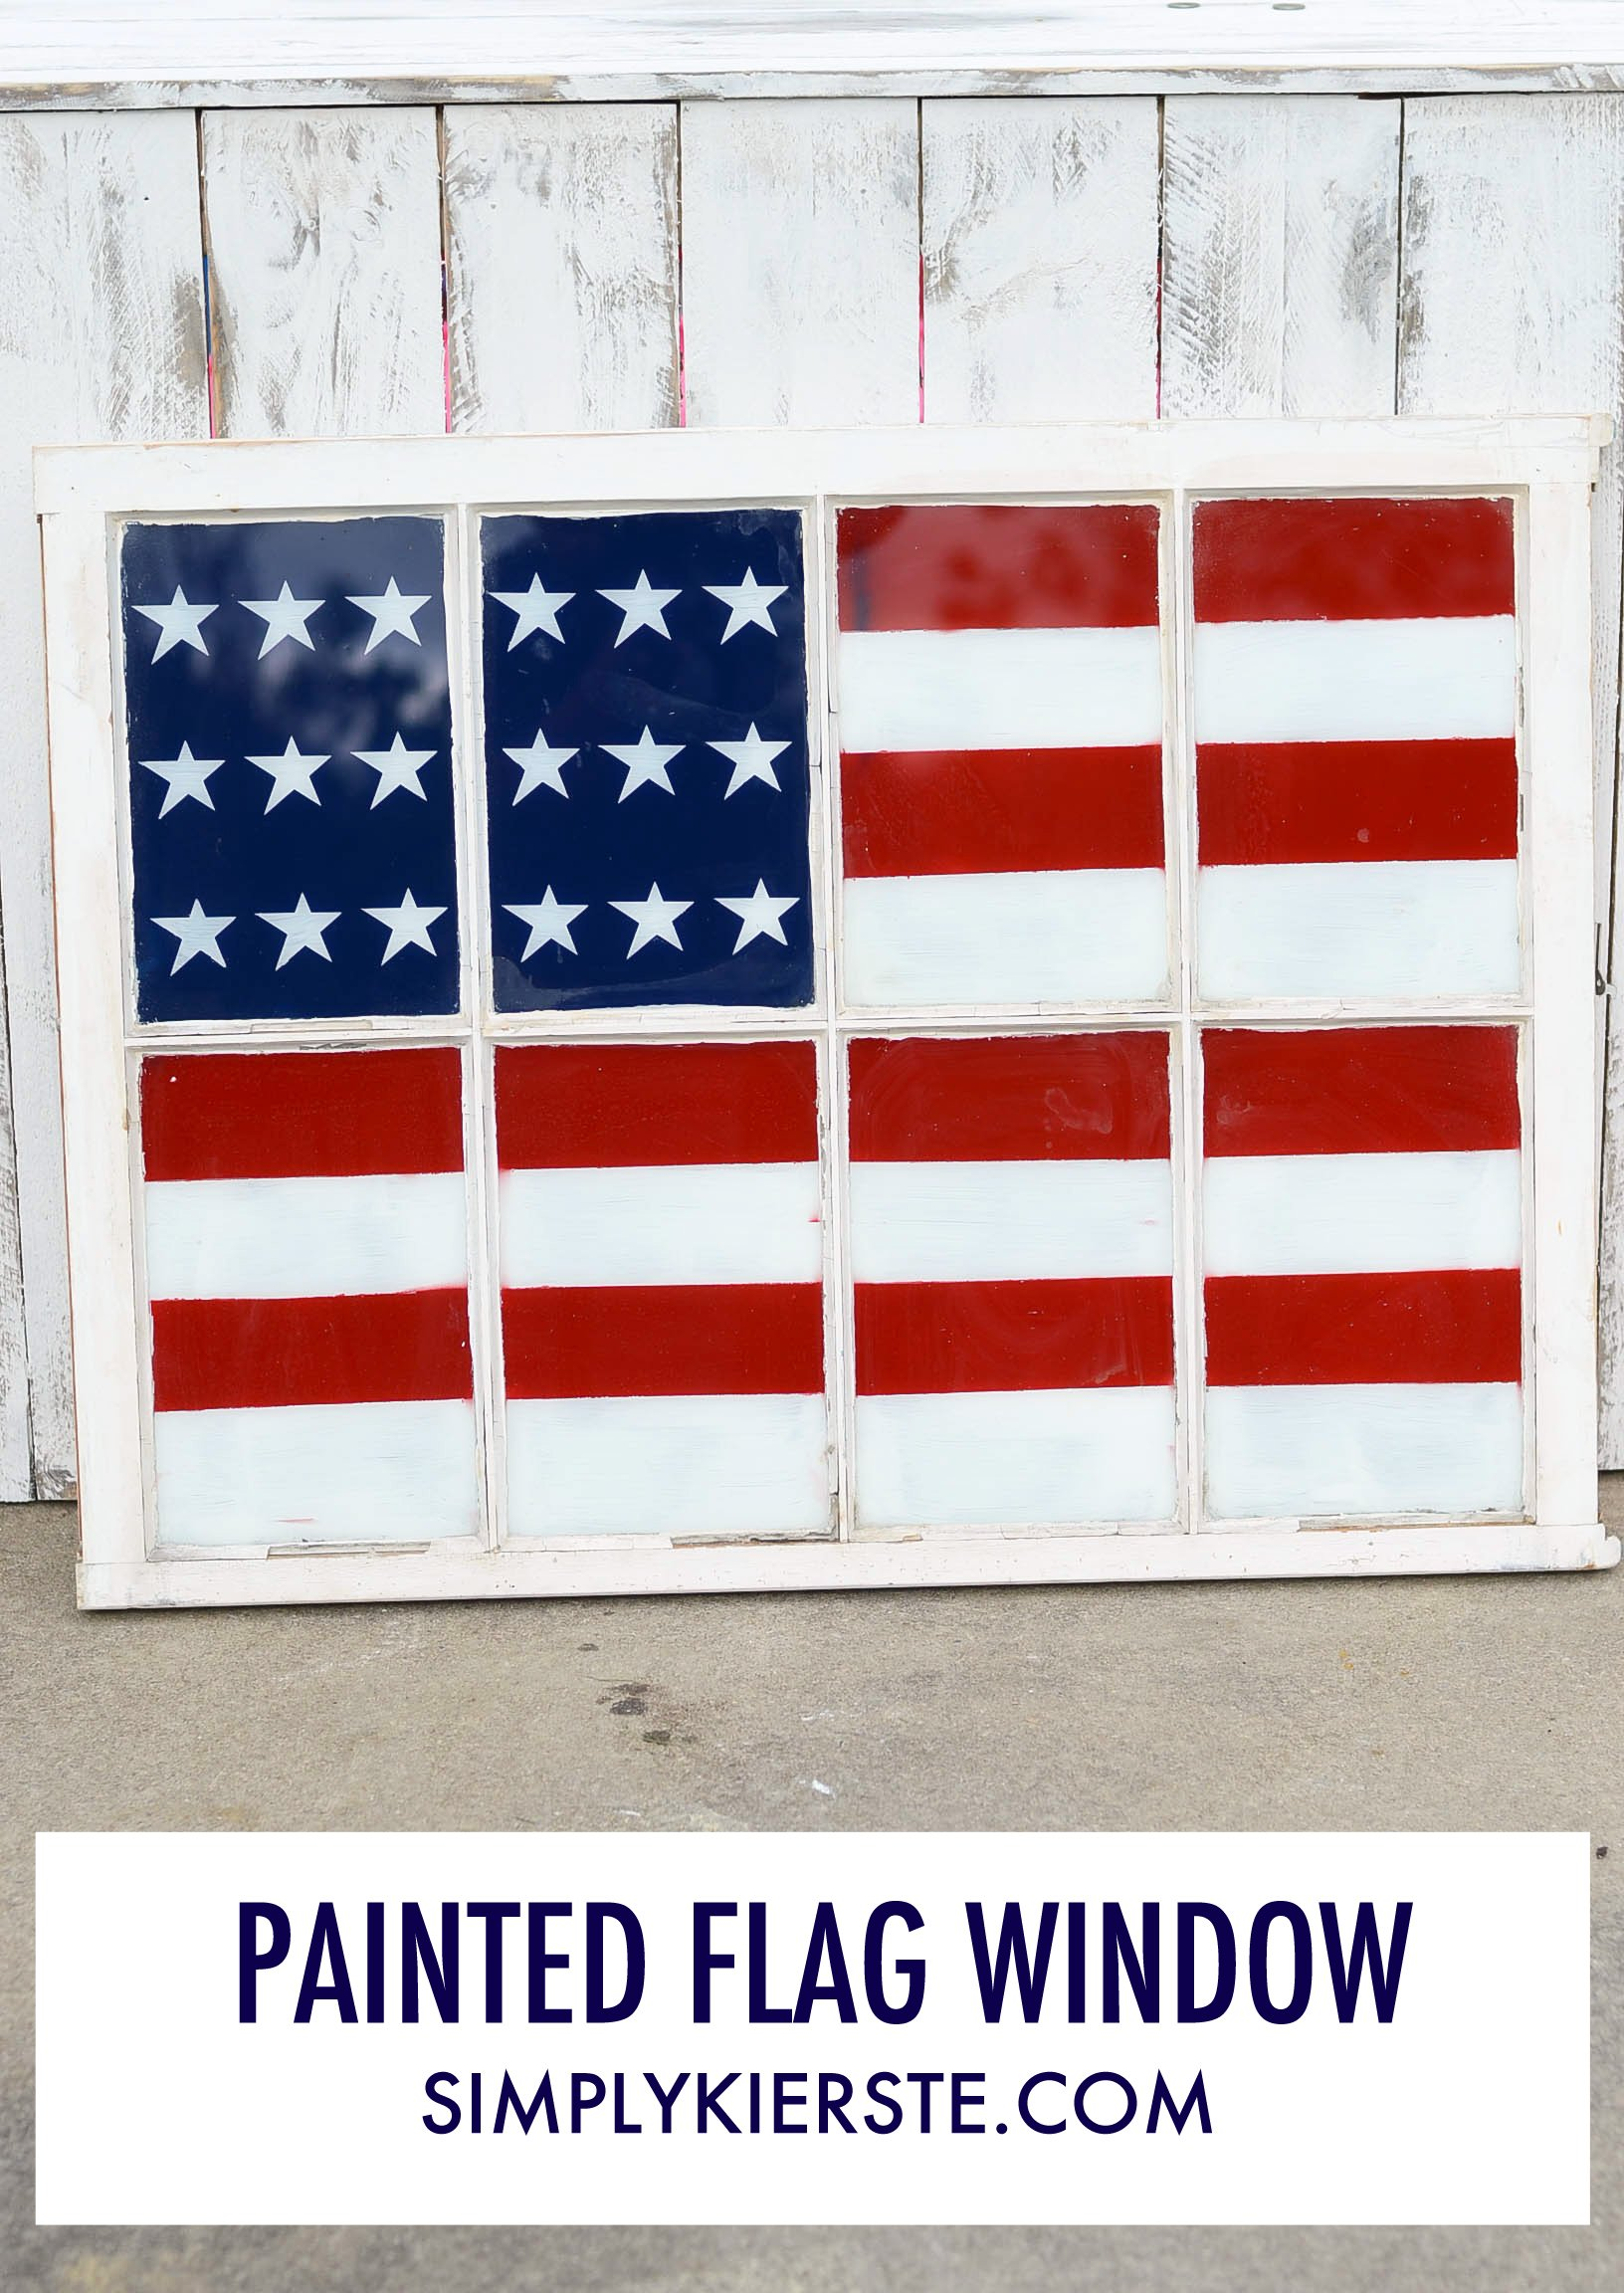 Painted Flag Window | 4th of July | oldsaltfarm.com